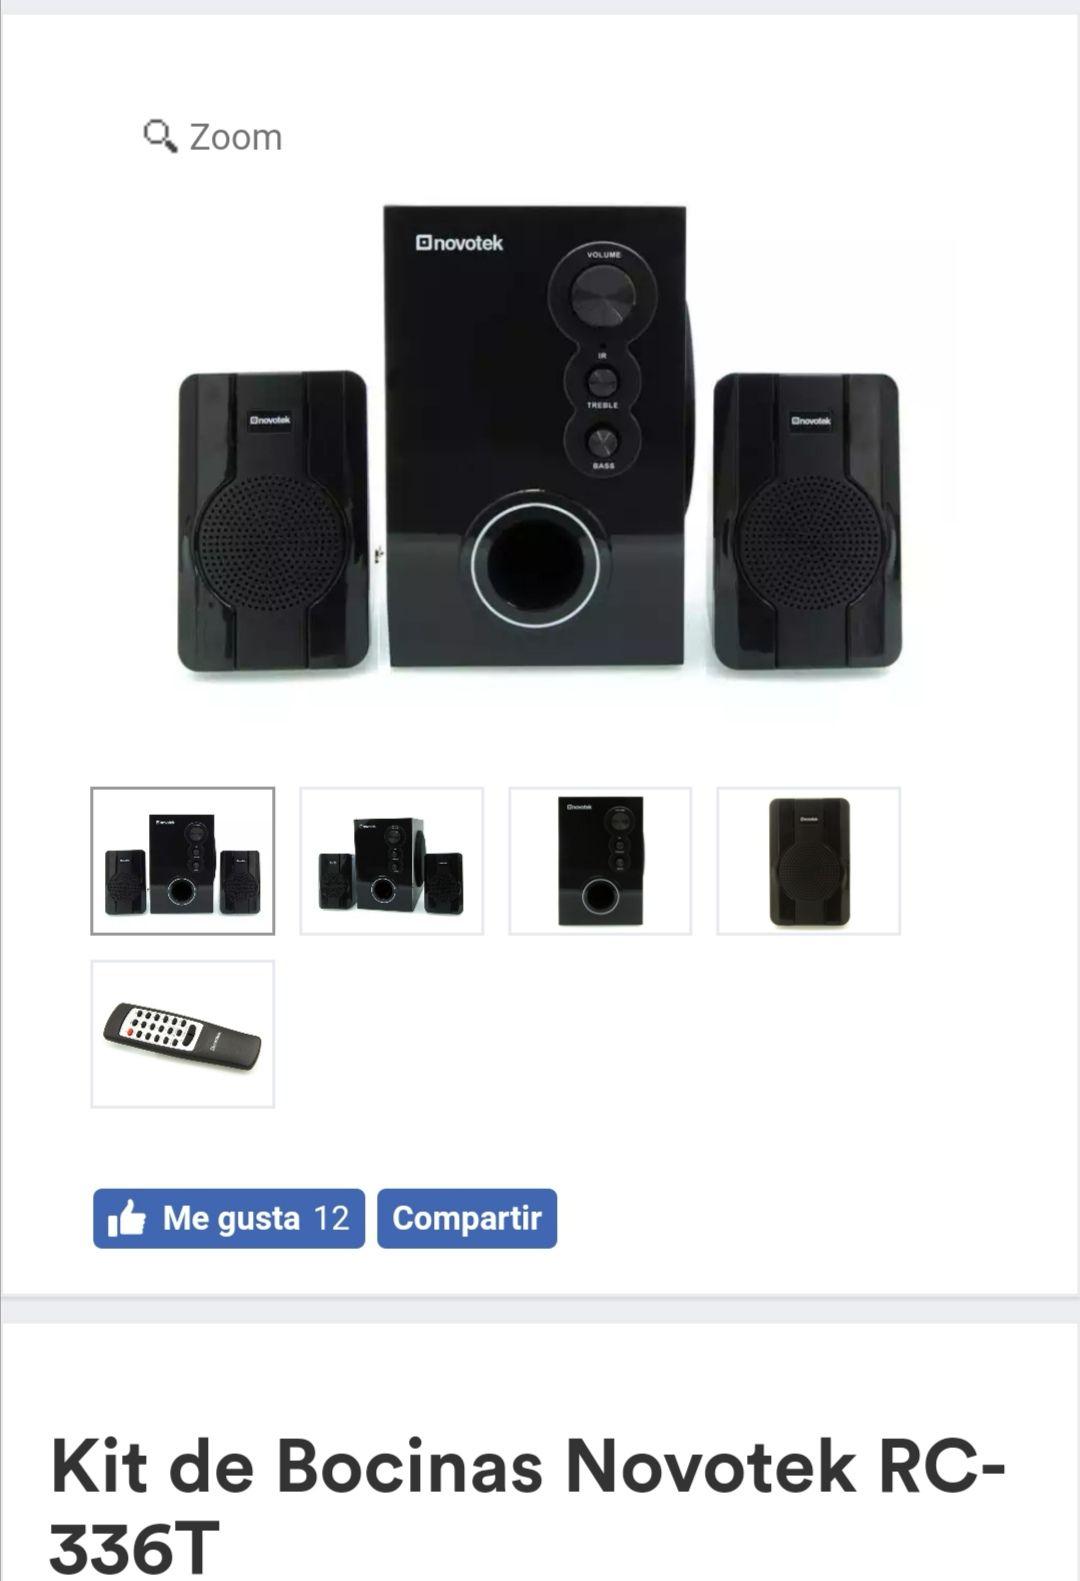 Coppel en línea: Kit de Bocinas Novotek RC-336T